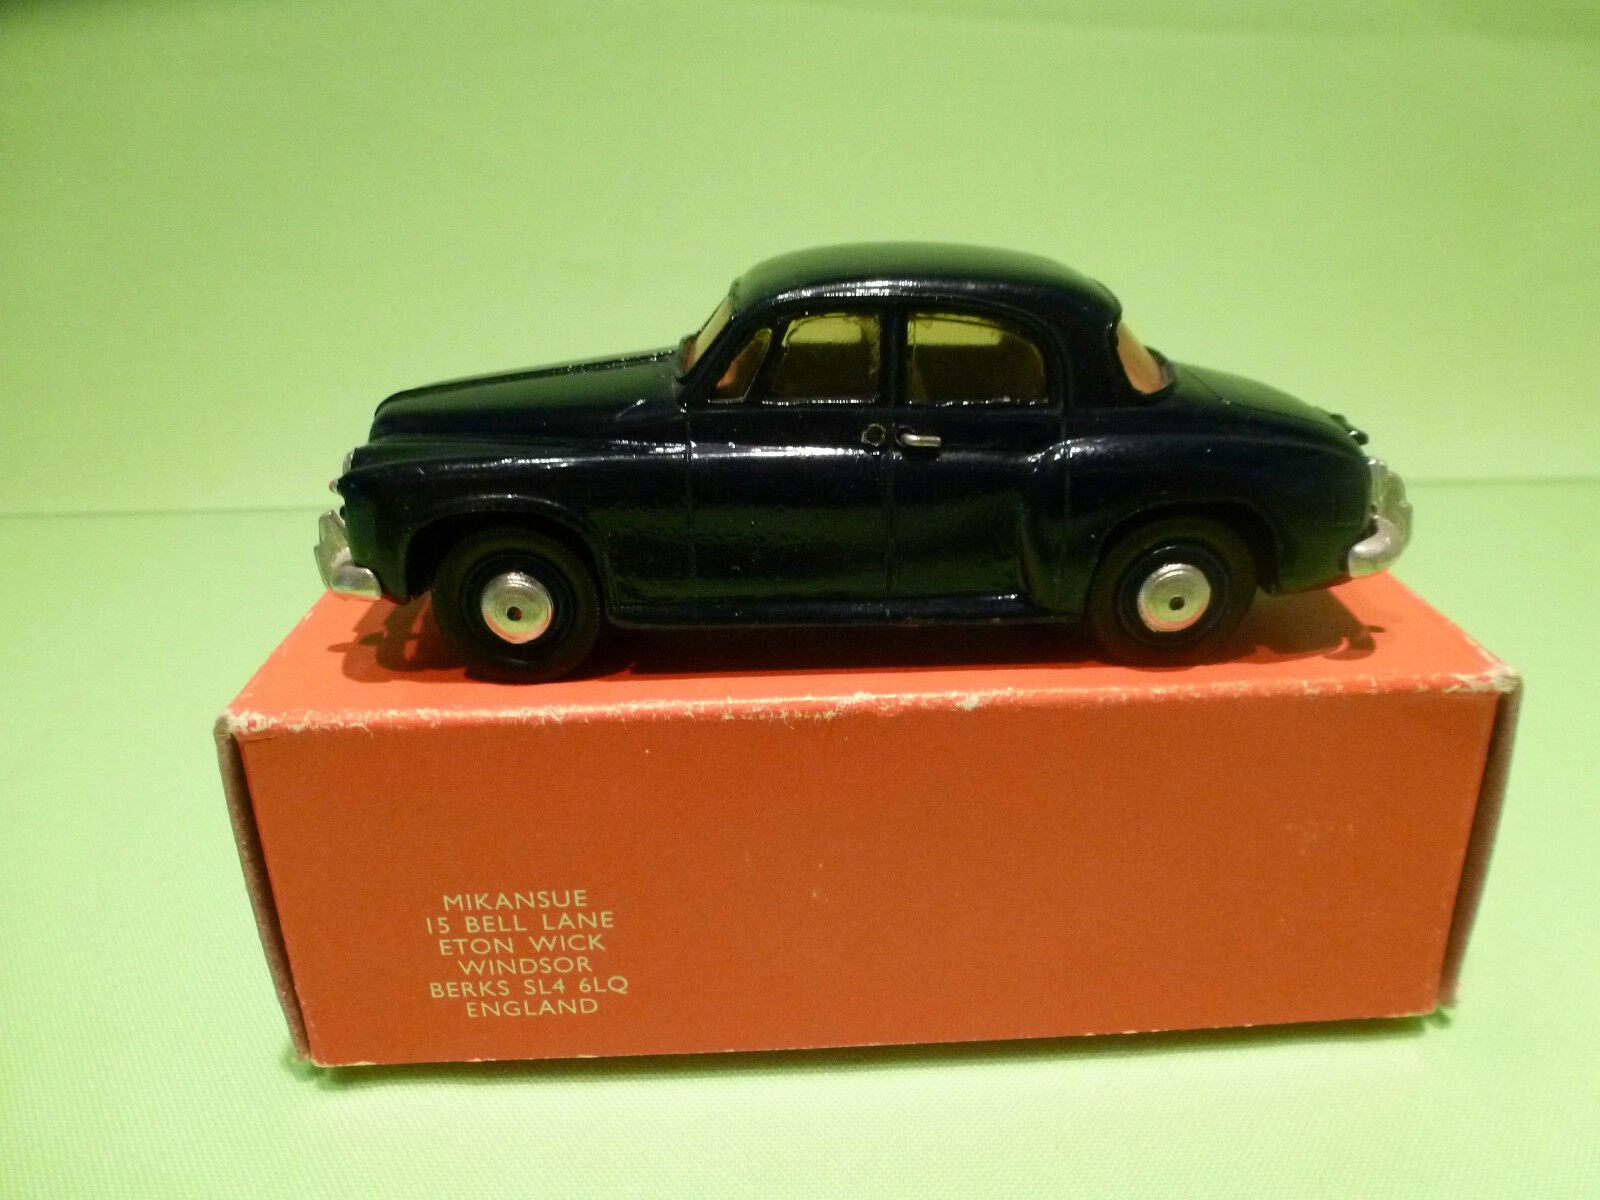 METAL BUILT KIT 32 MIKANSUE ROVER 100 1961 - DARK BLUE 1:42 - VERY GOOD IN BOX